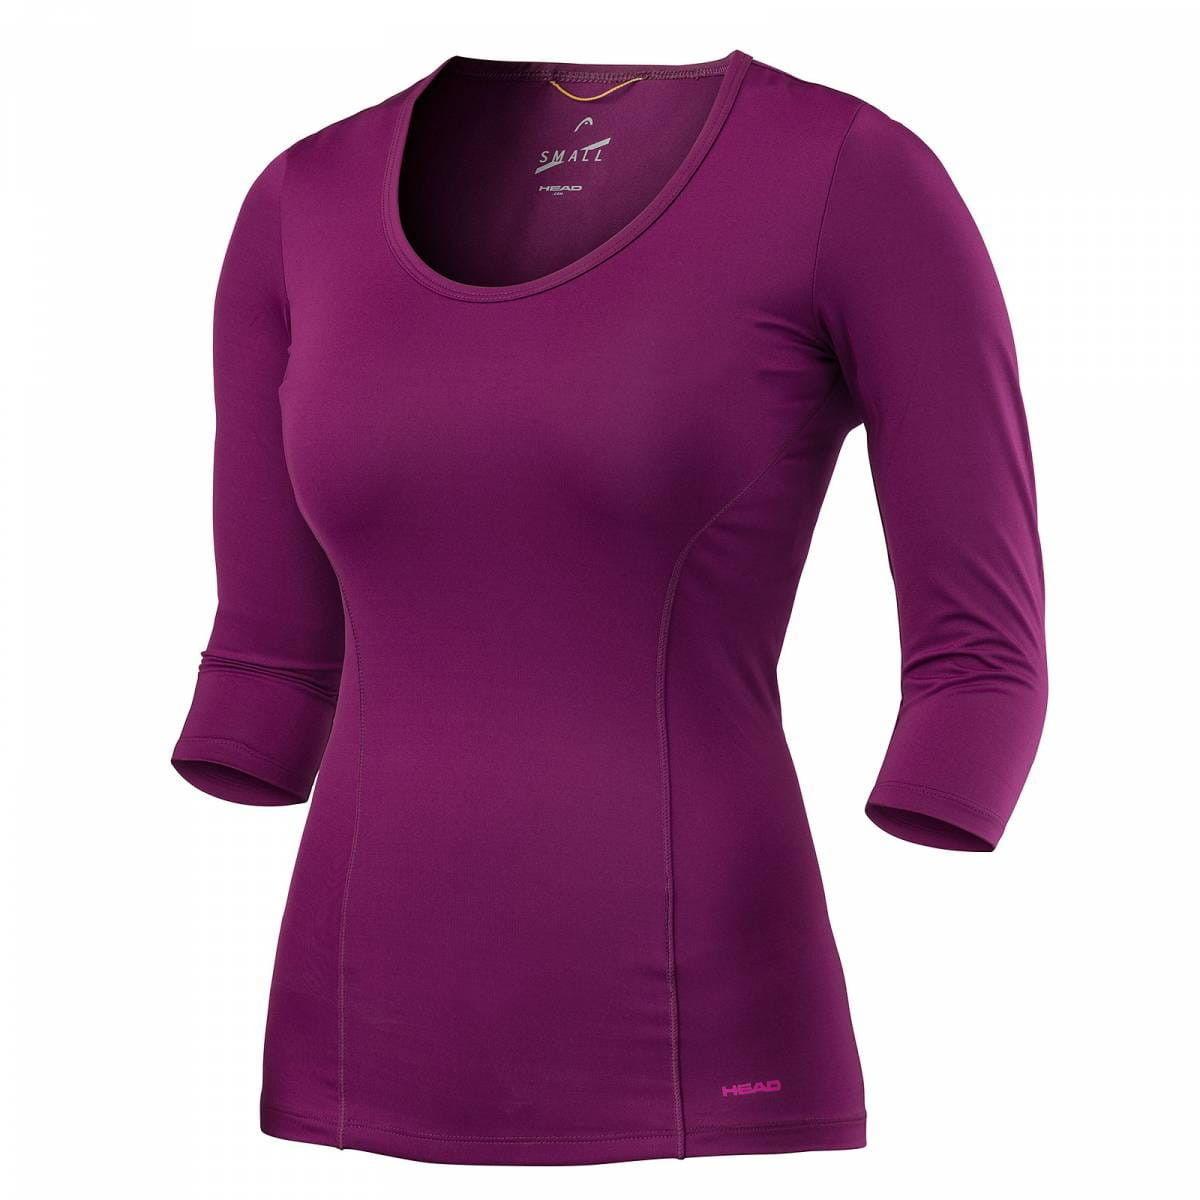 Head Vision 3/4 Shirt W - purple 814477-PU